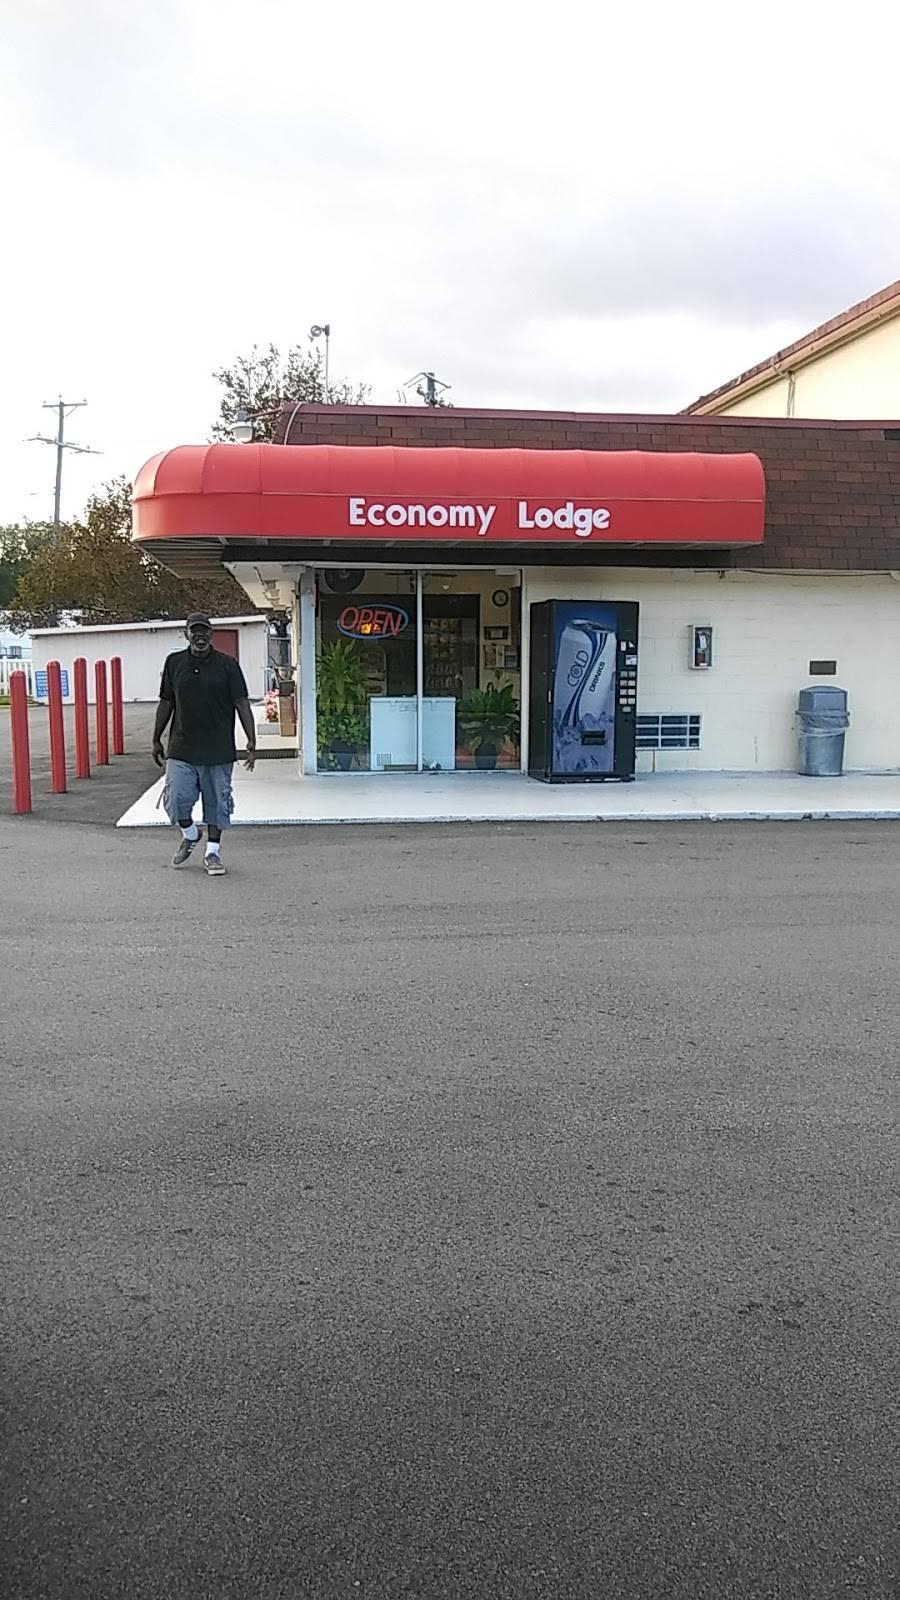 Economy Lodge - lodging  | Photo 2 of 3 | Address: 1015 Broad St, Portsmouth, VA 23707, USA | Phone: (757) 399-6341